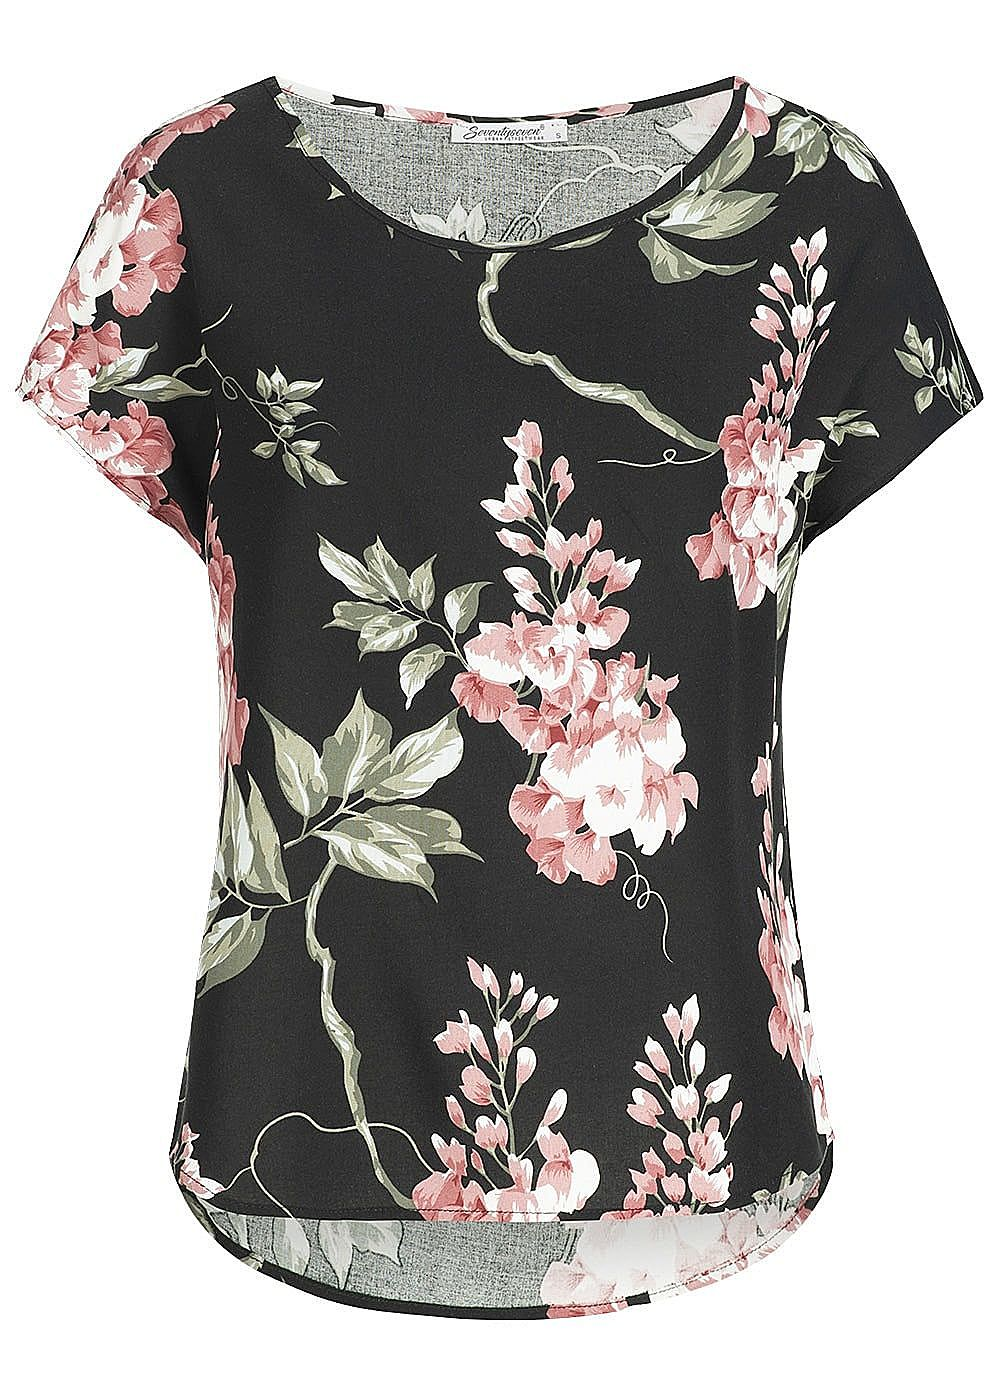 a4c17f959e379f Seventyseven Lifestyle Damen Blusen Shirt Blumen Print schwarz rosa grün